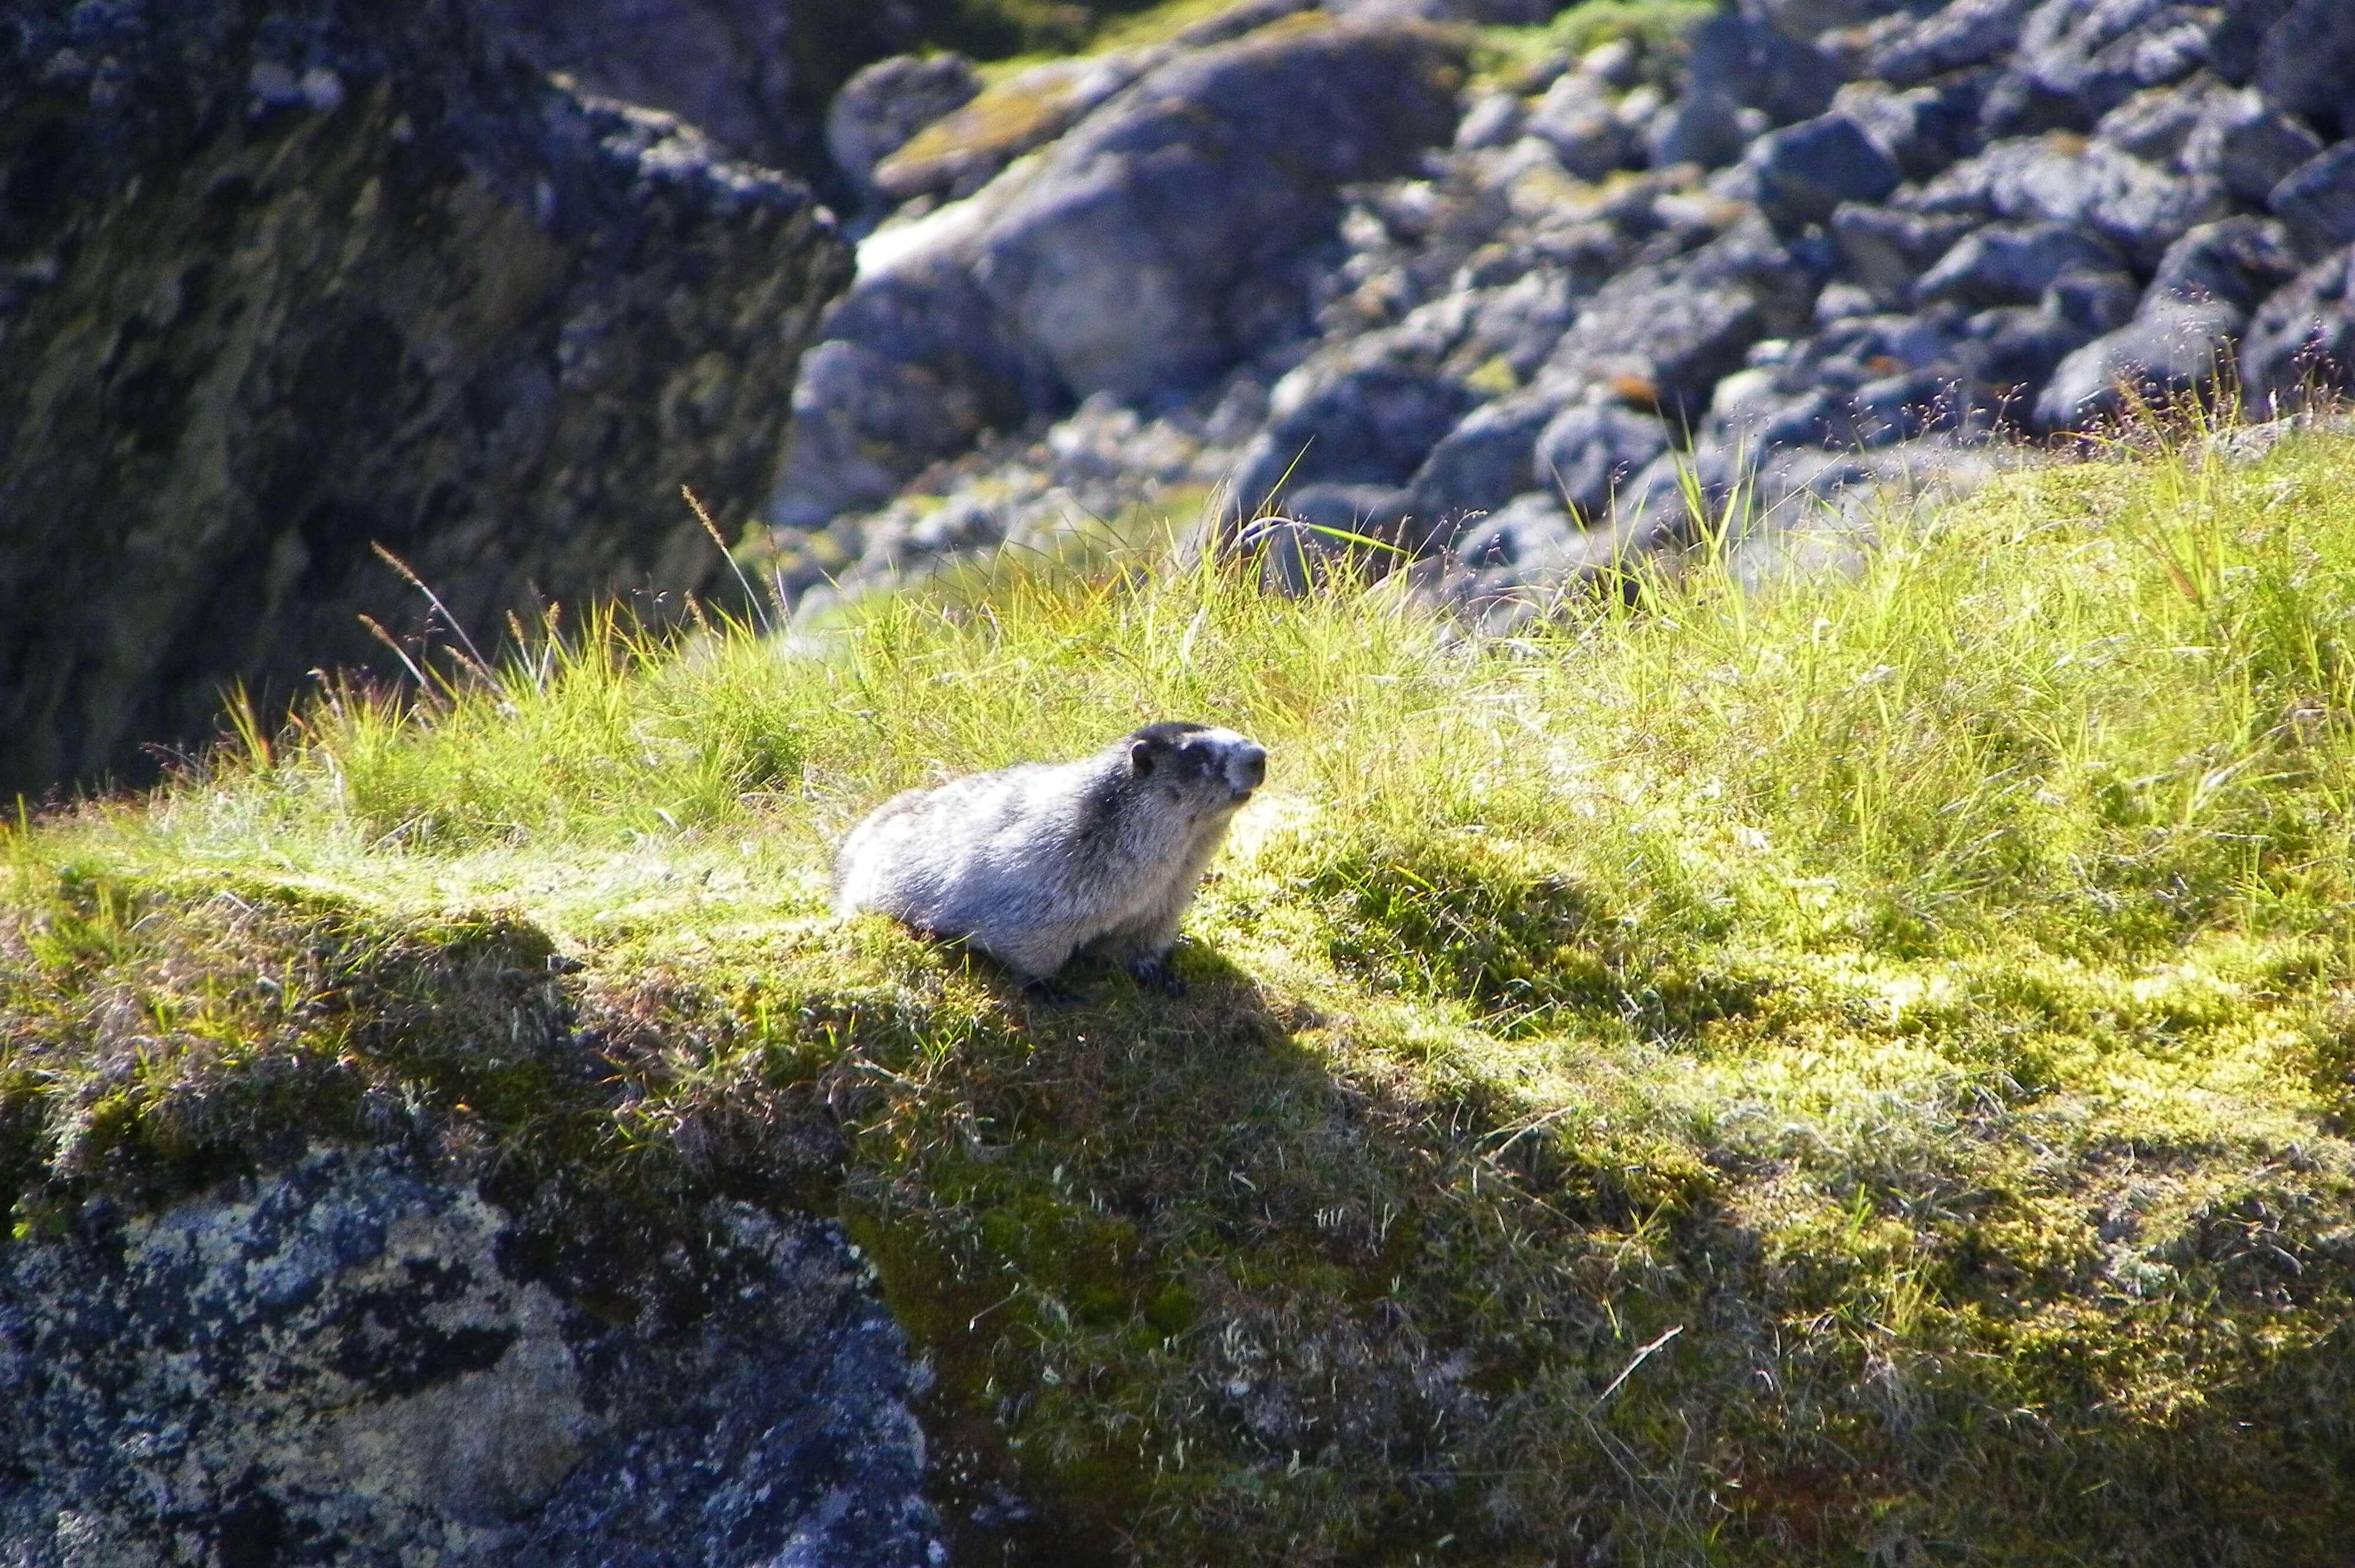 Marmot chillin